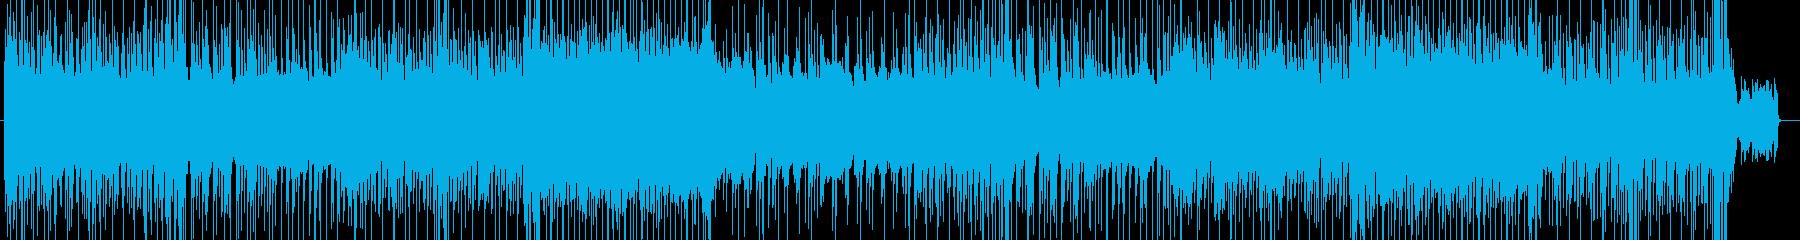 HARD・DARK/DEATH 294の再生済みの波形